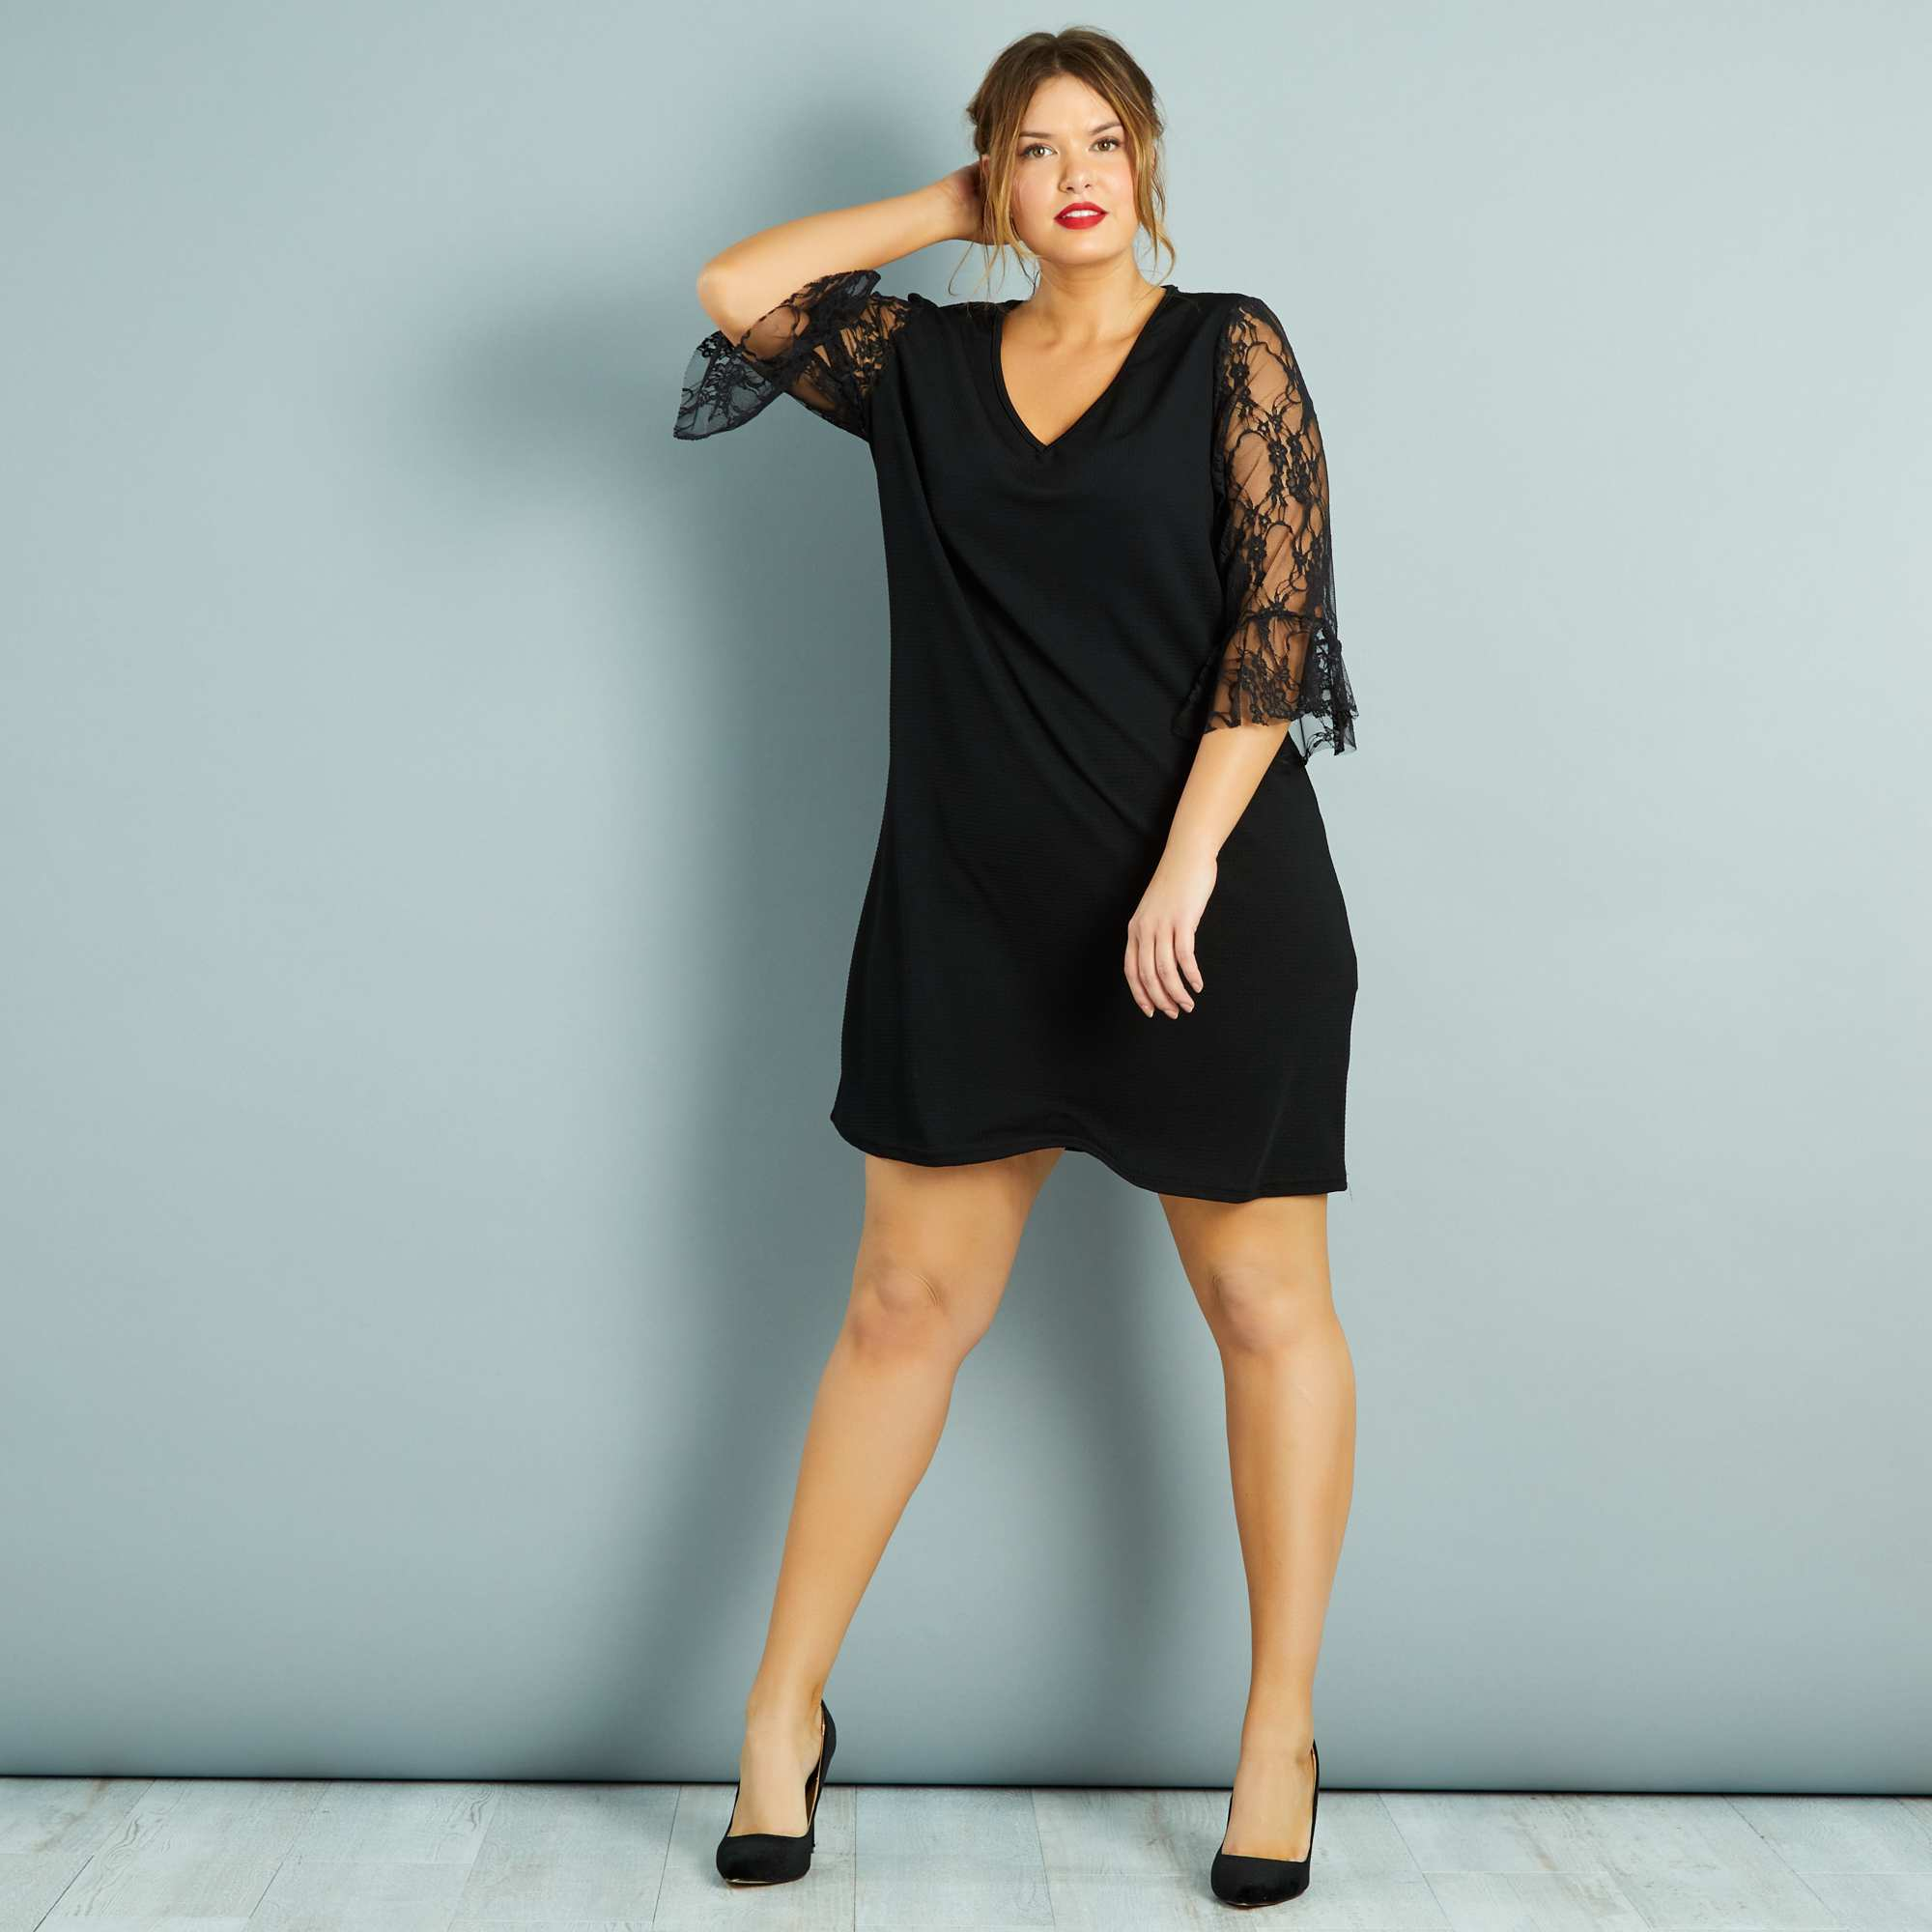 robe courte manches en dentelle noir grande taille femme wa105_1_zc1